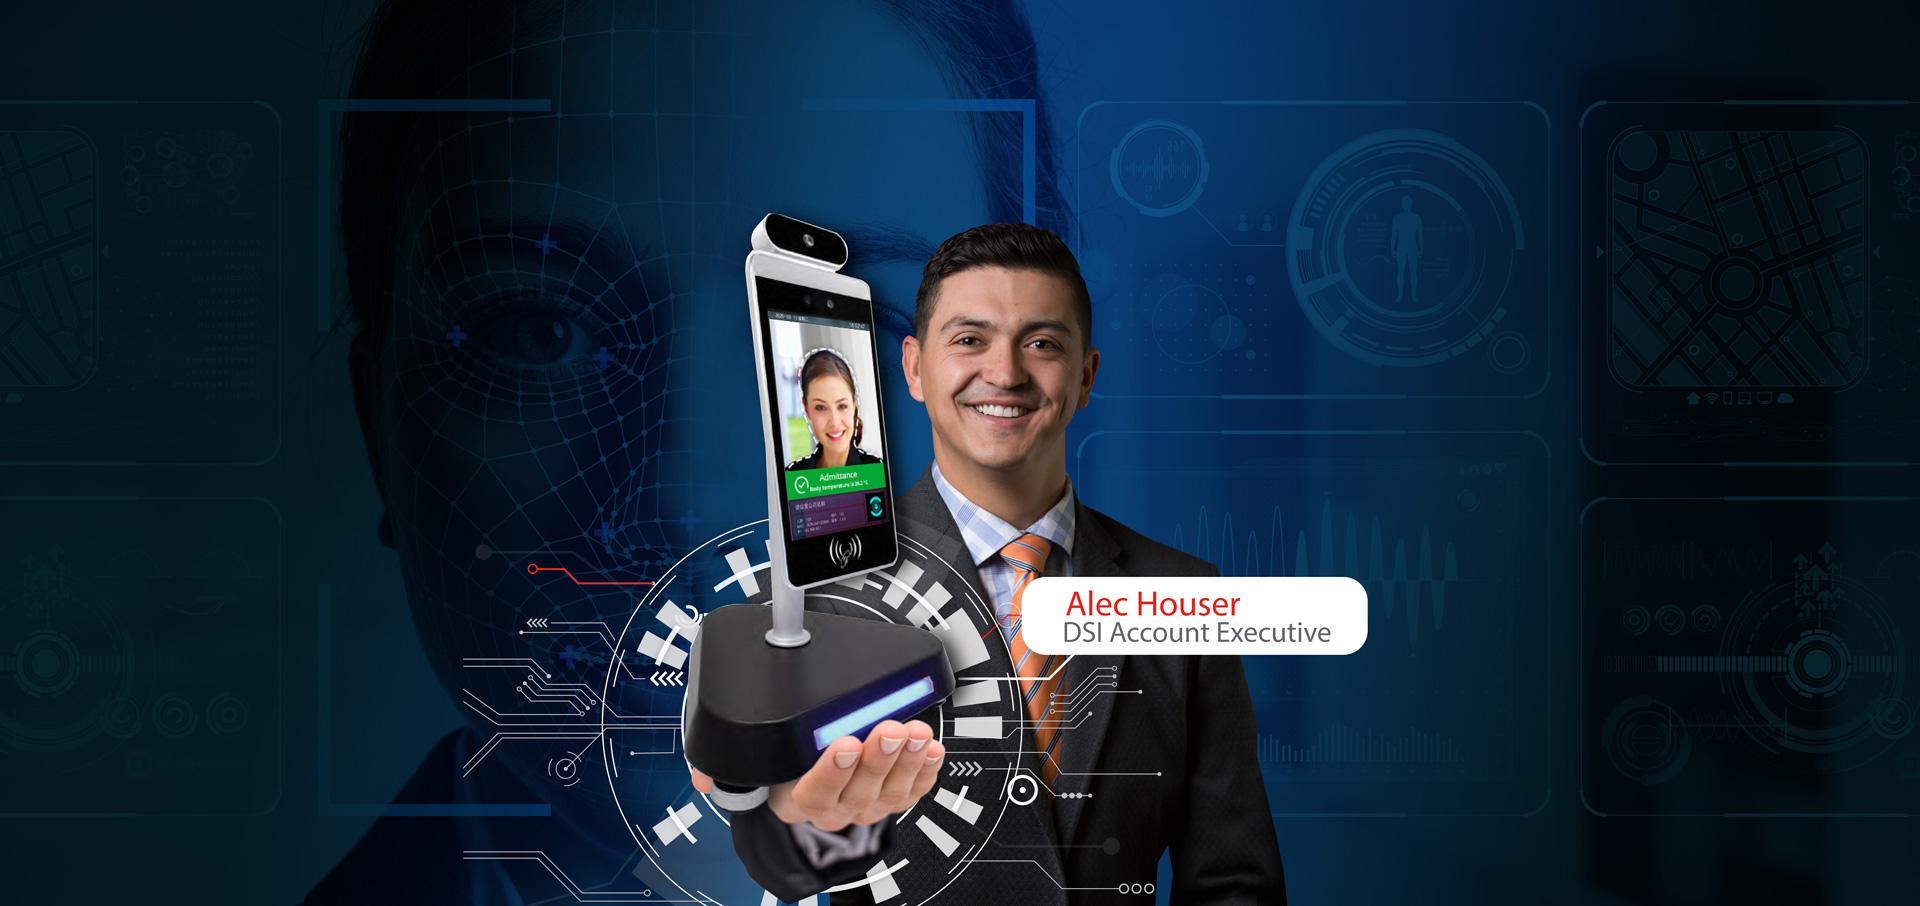 DSI executive holding Go Safe technology